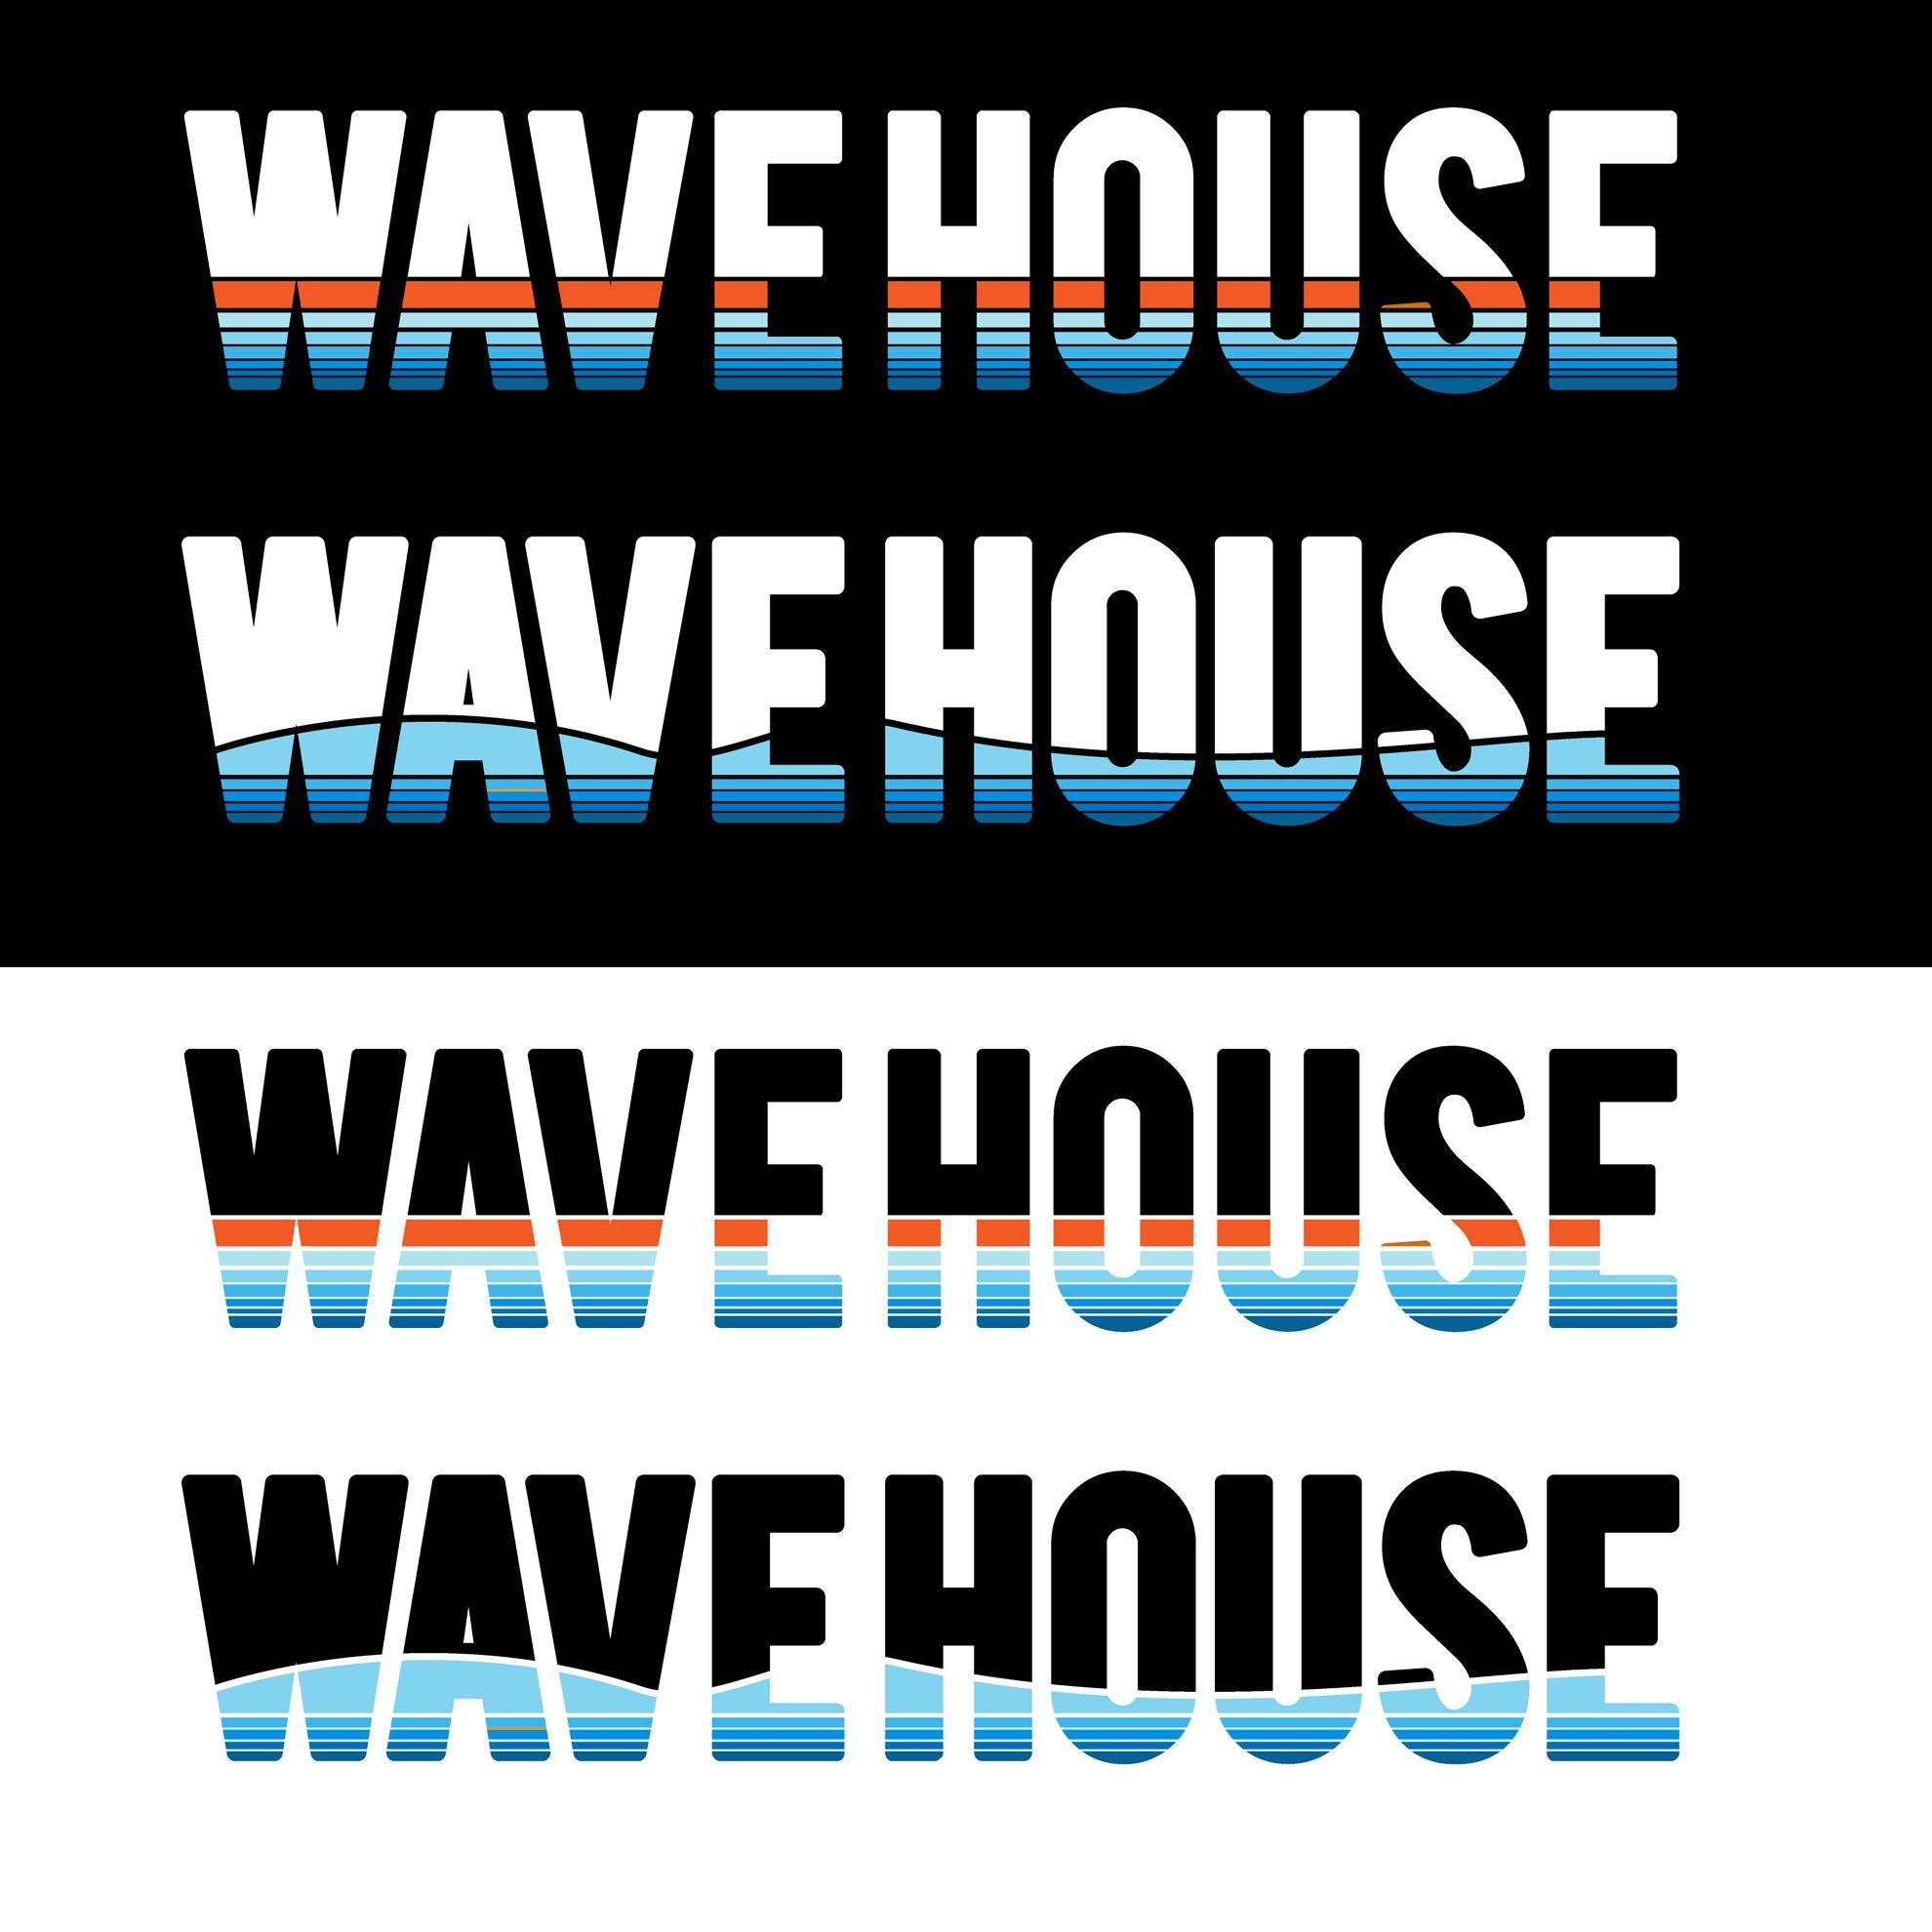 Редизайн логотипа для серф-кэмпа на Бали - дизайнер theonewhosaves